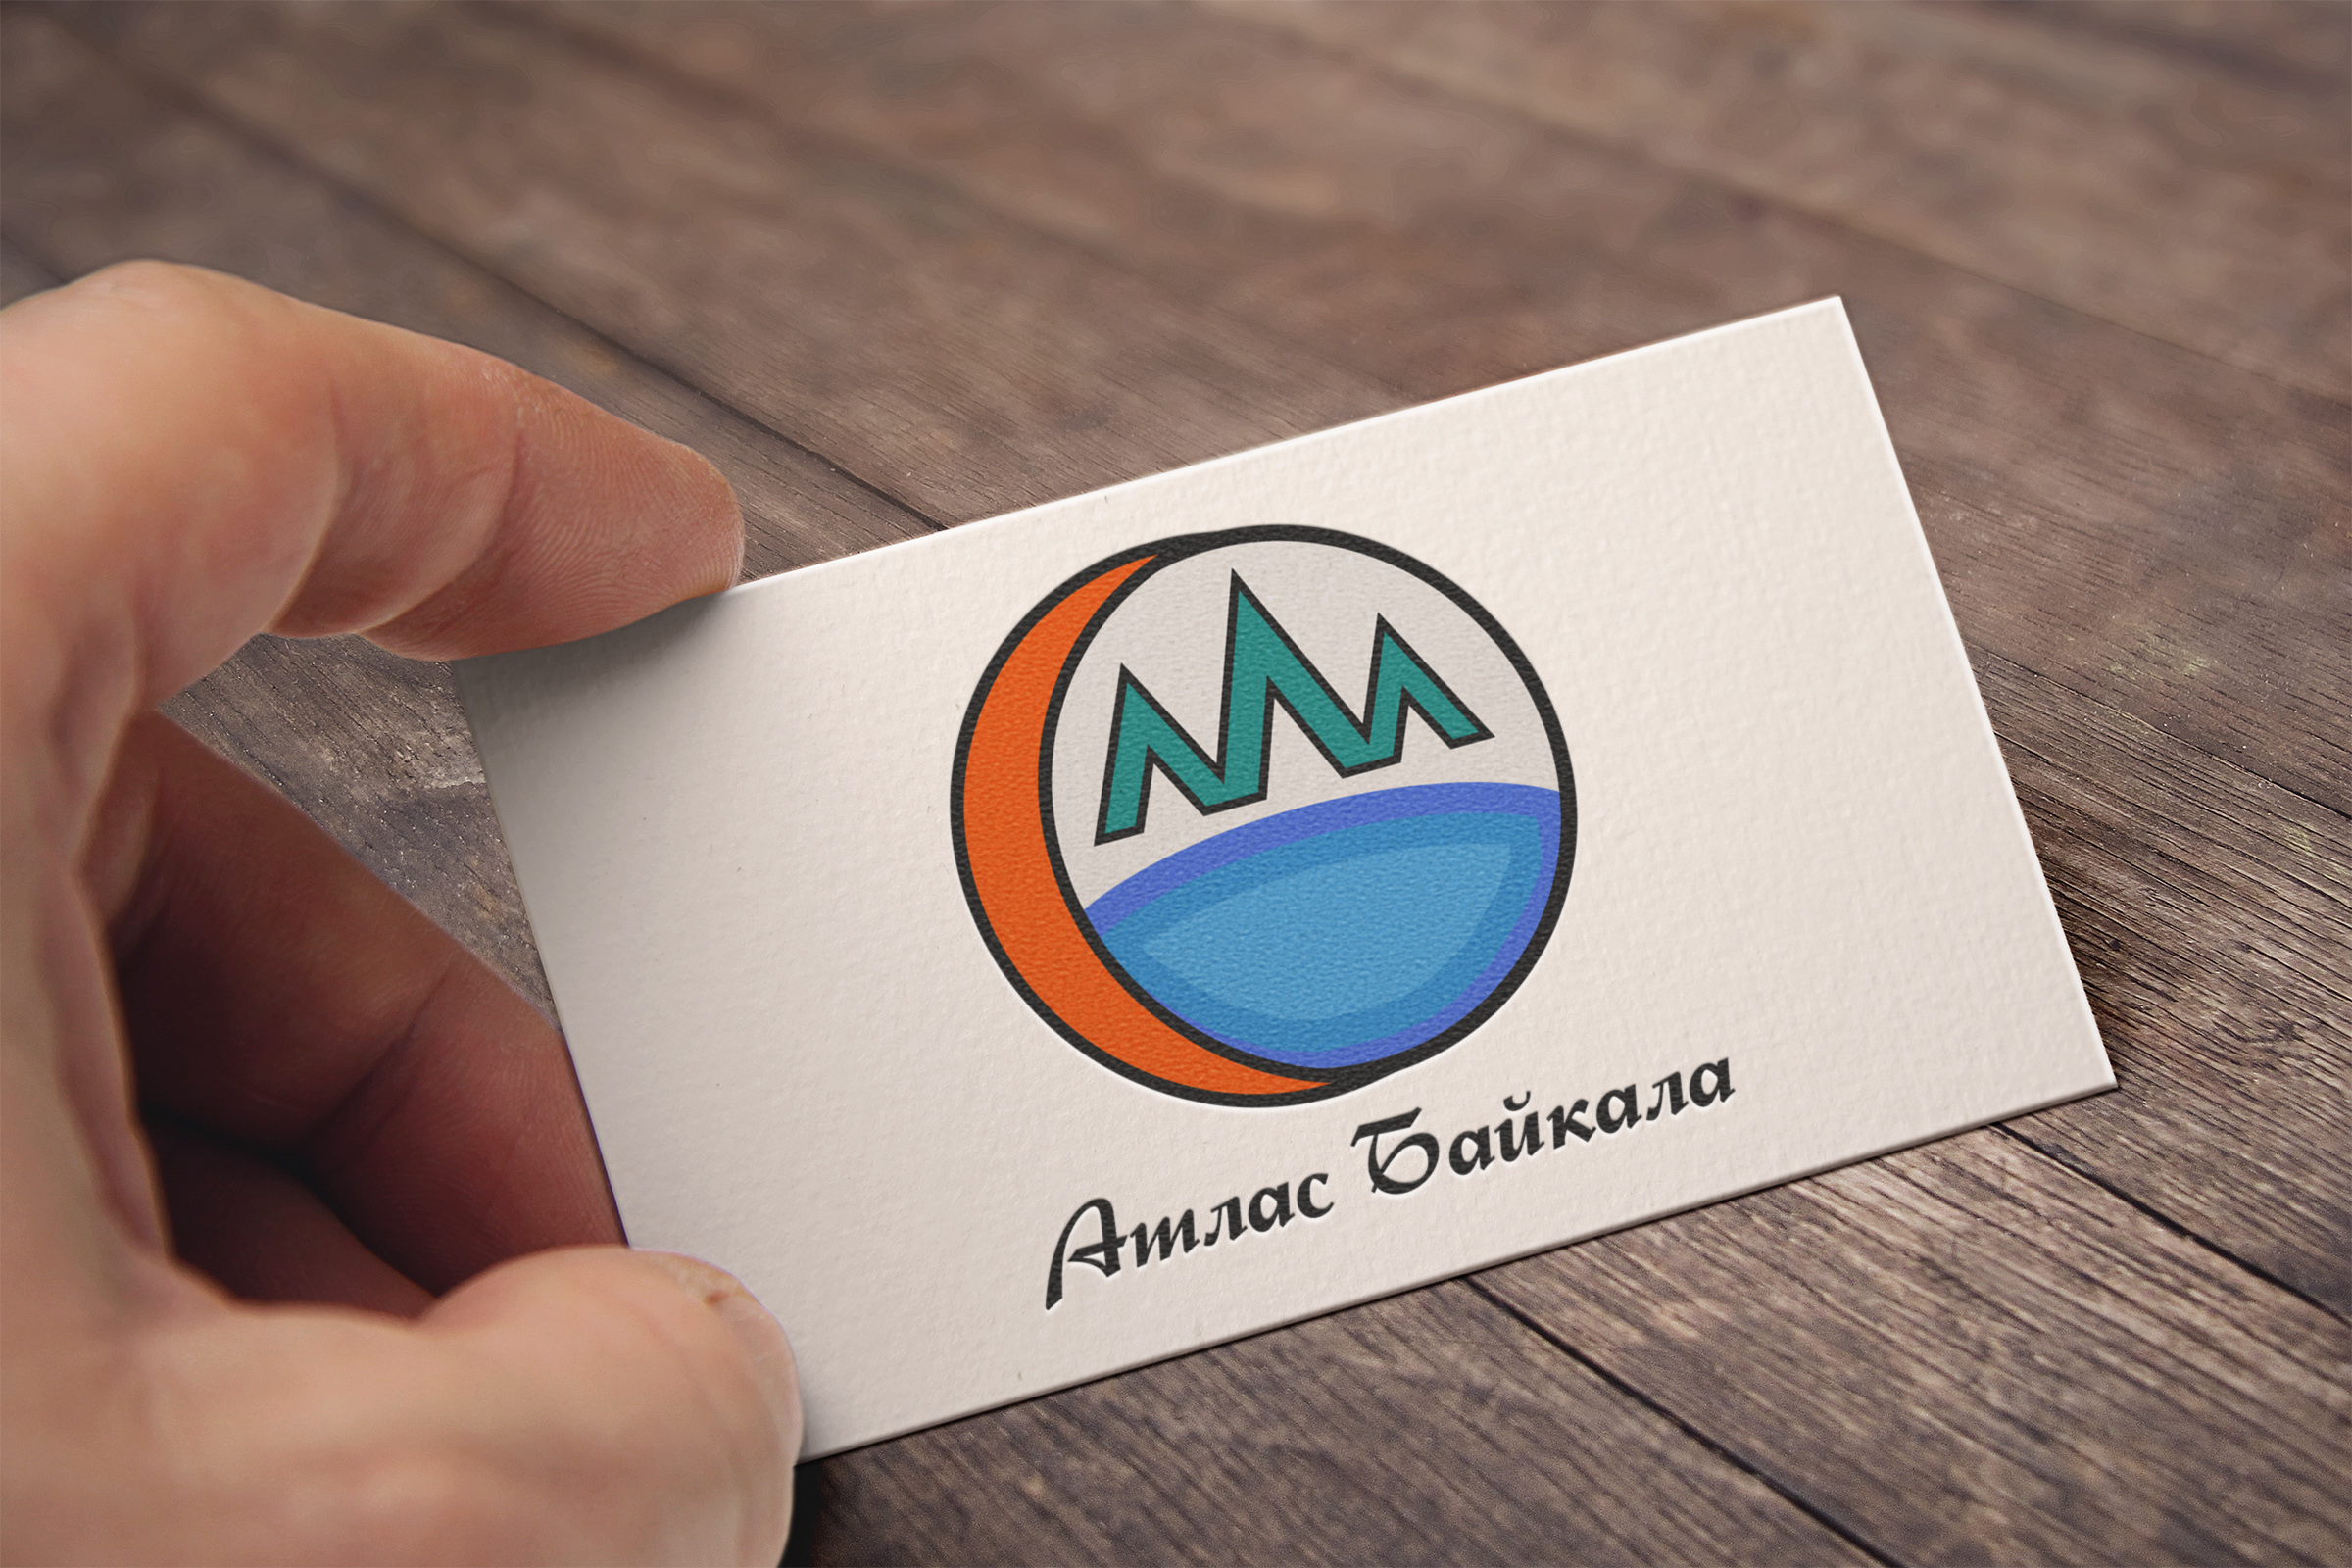 Разработка логотипа Атлас Байкала фото f_2485af97bf4dc545.jpg